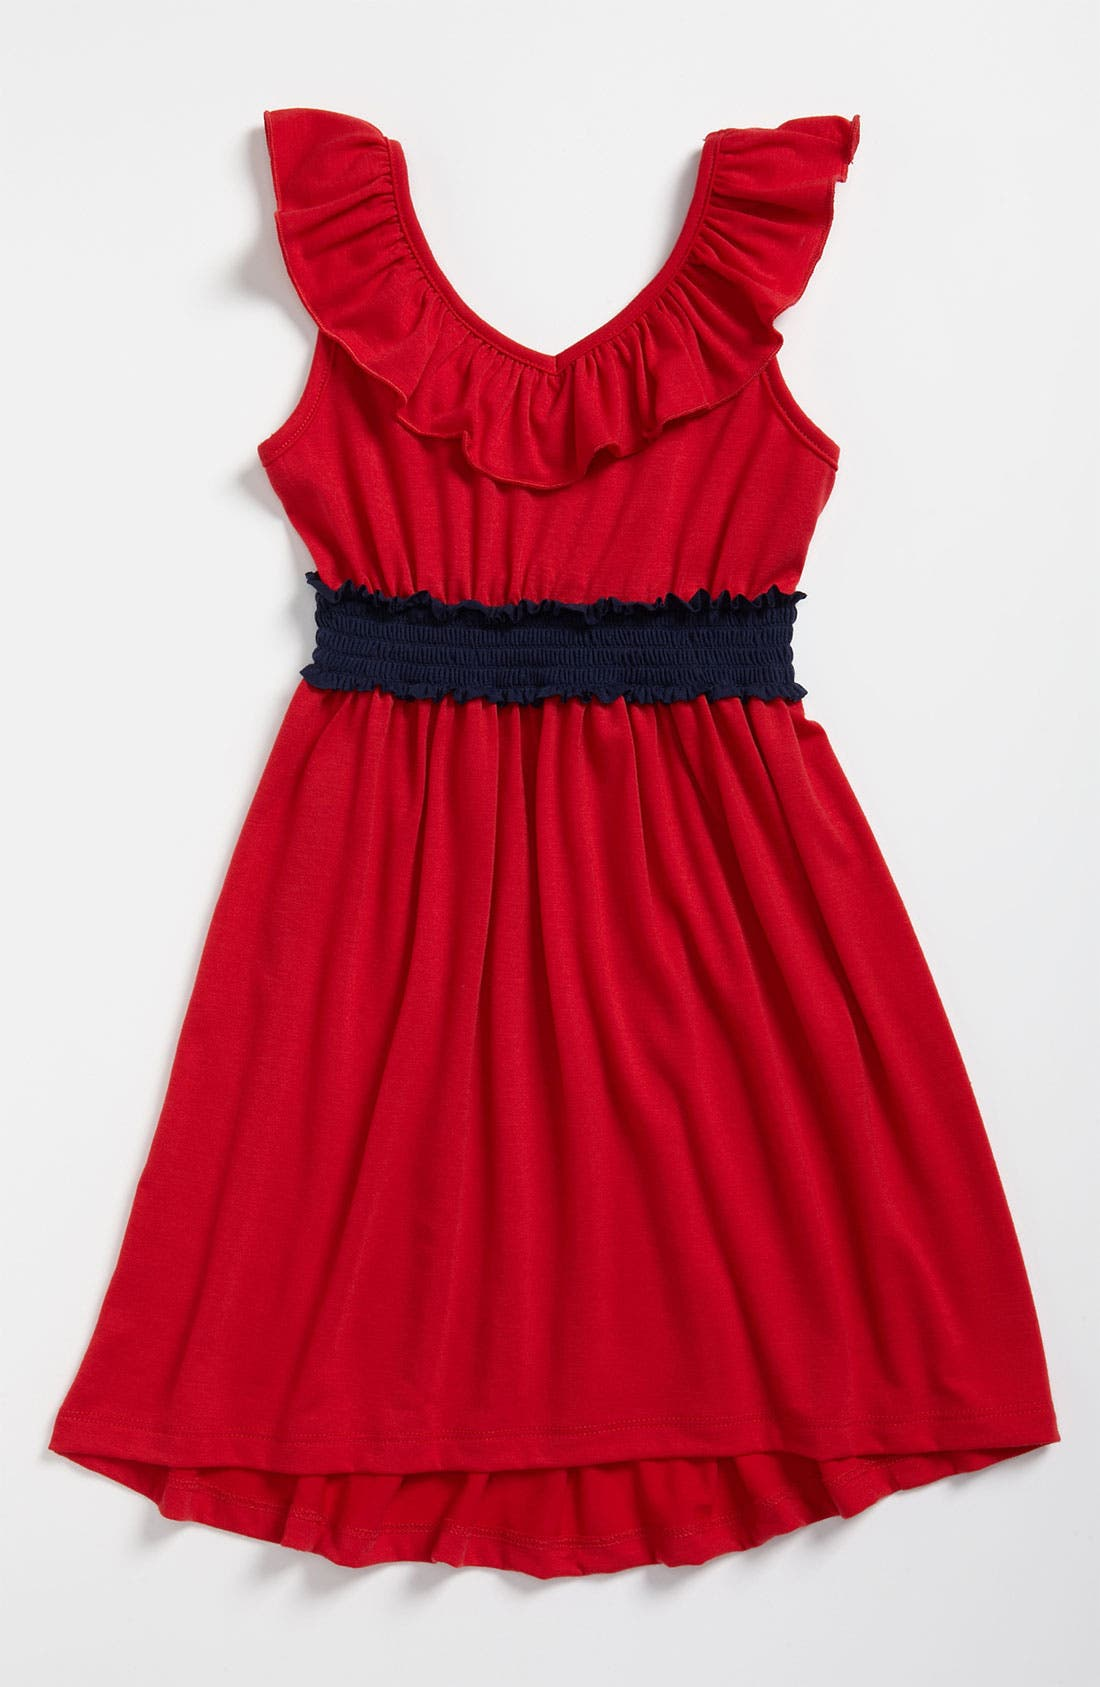 Main Image - Zunie Ruffle Neck Dress (Little Girls & Big Girls)